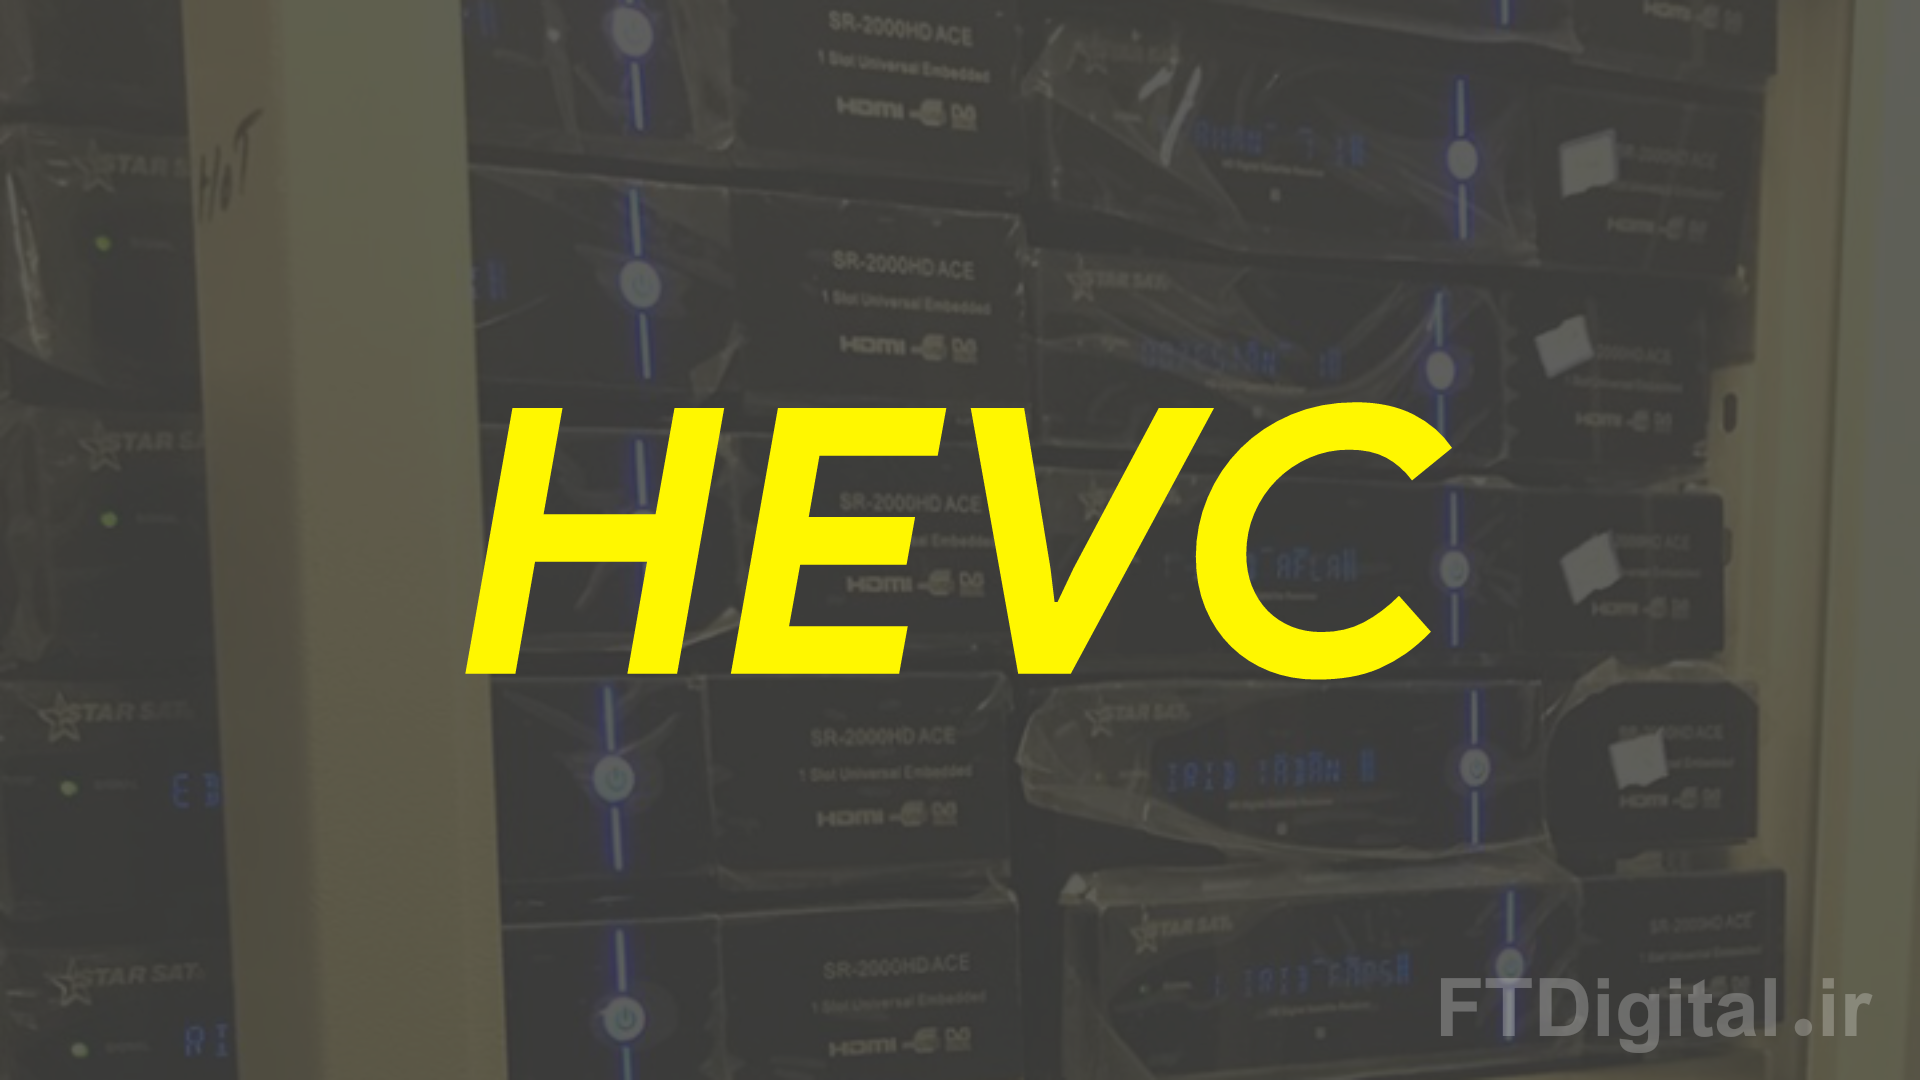 کدک HEVC چیست و چگونه کار میکند؟